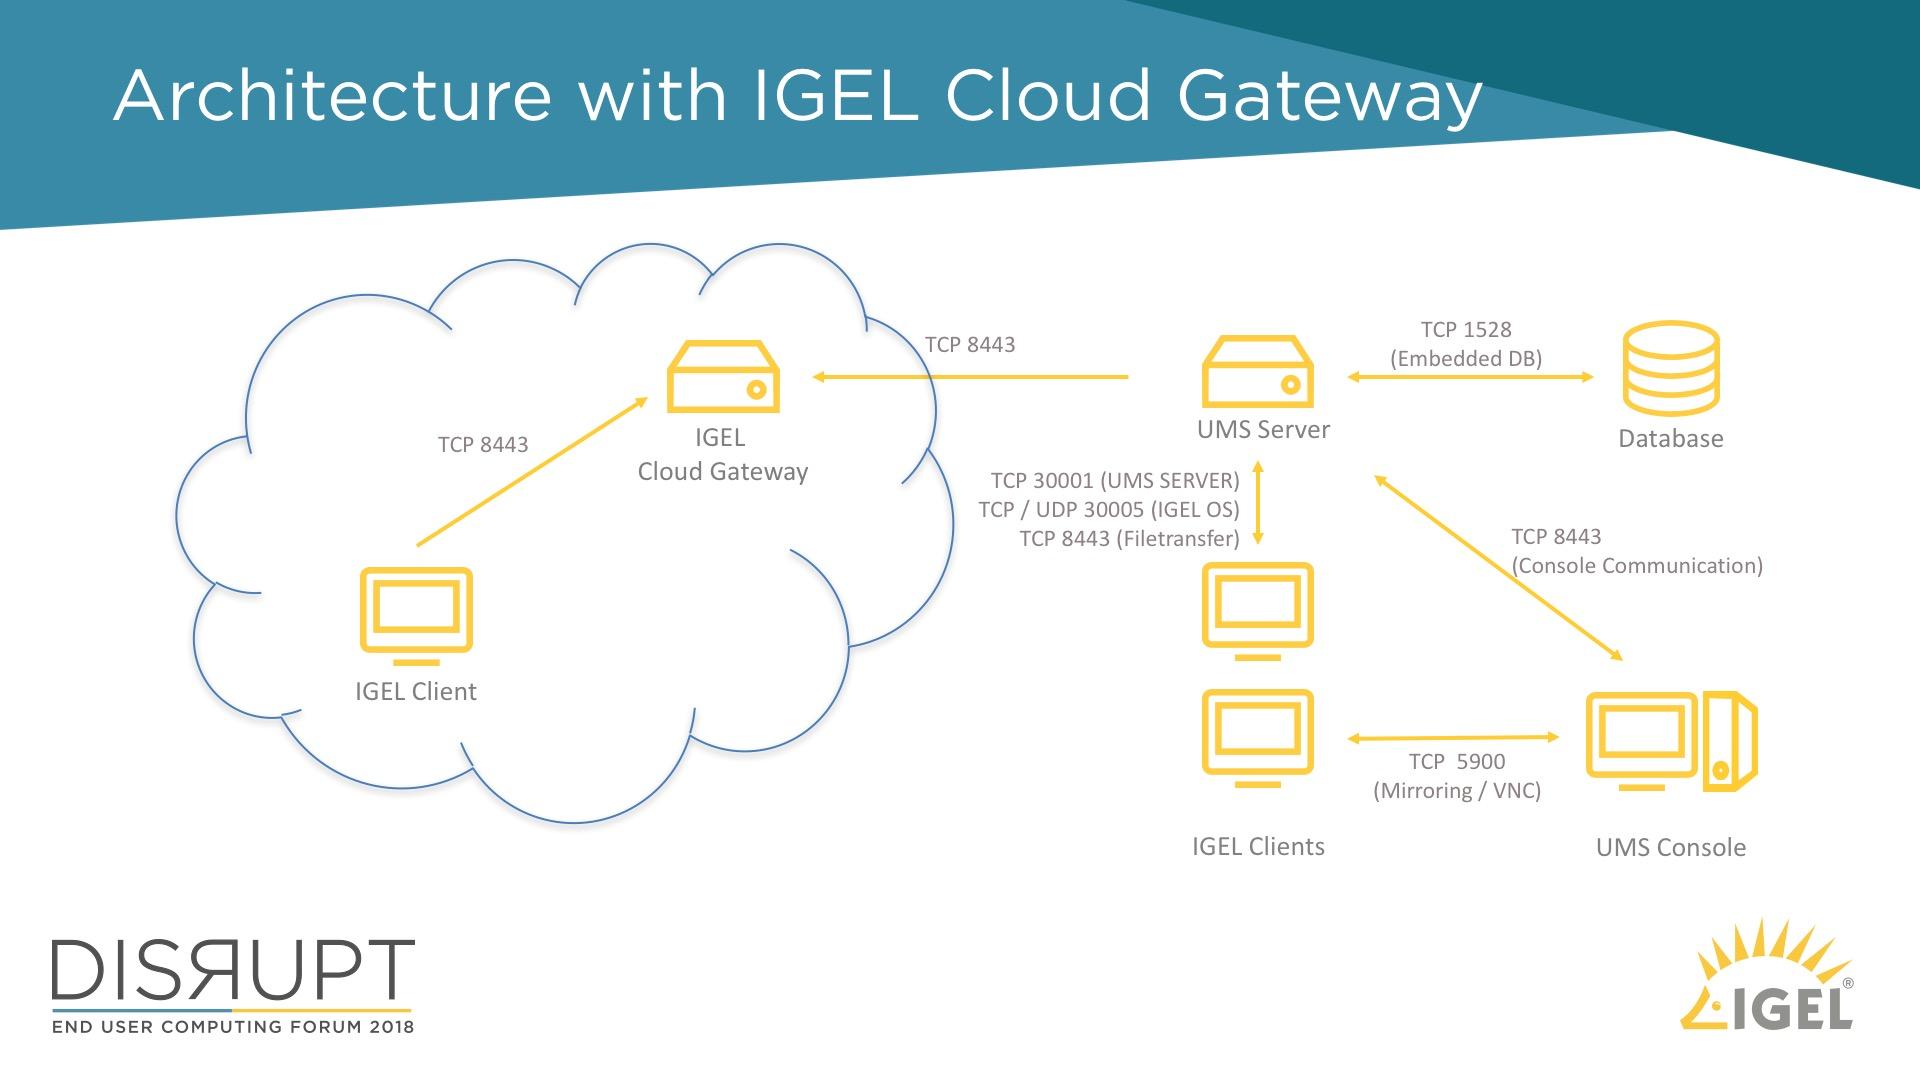 IGEL Cloud Gateway